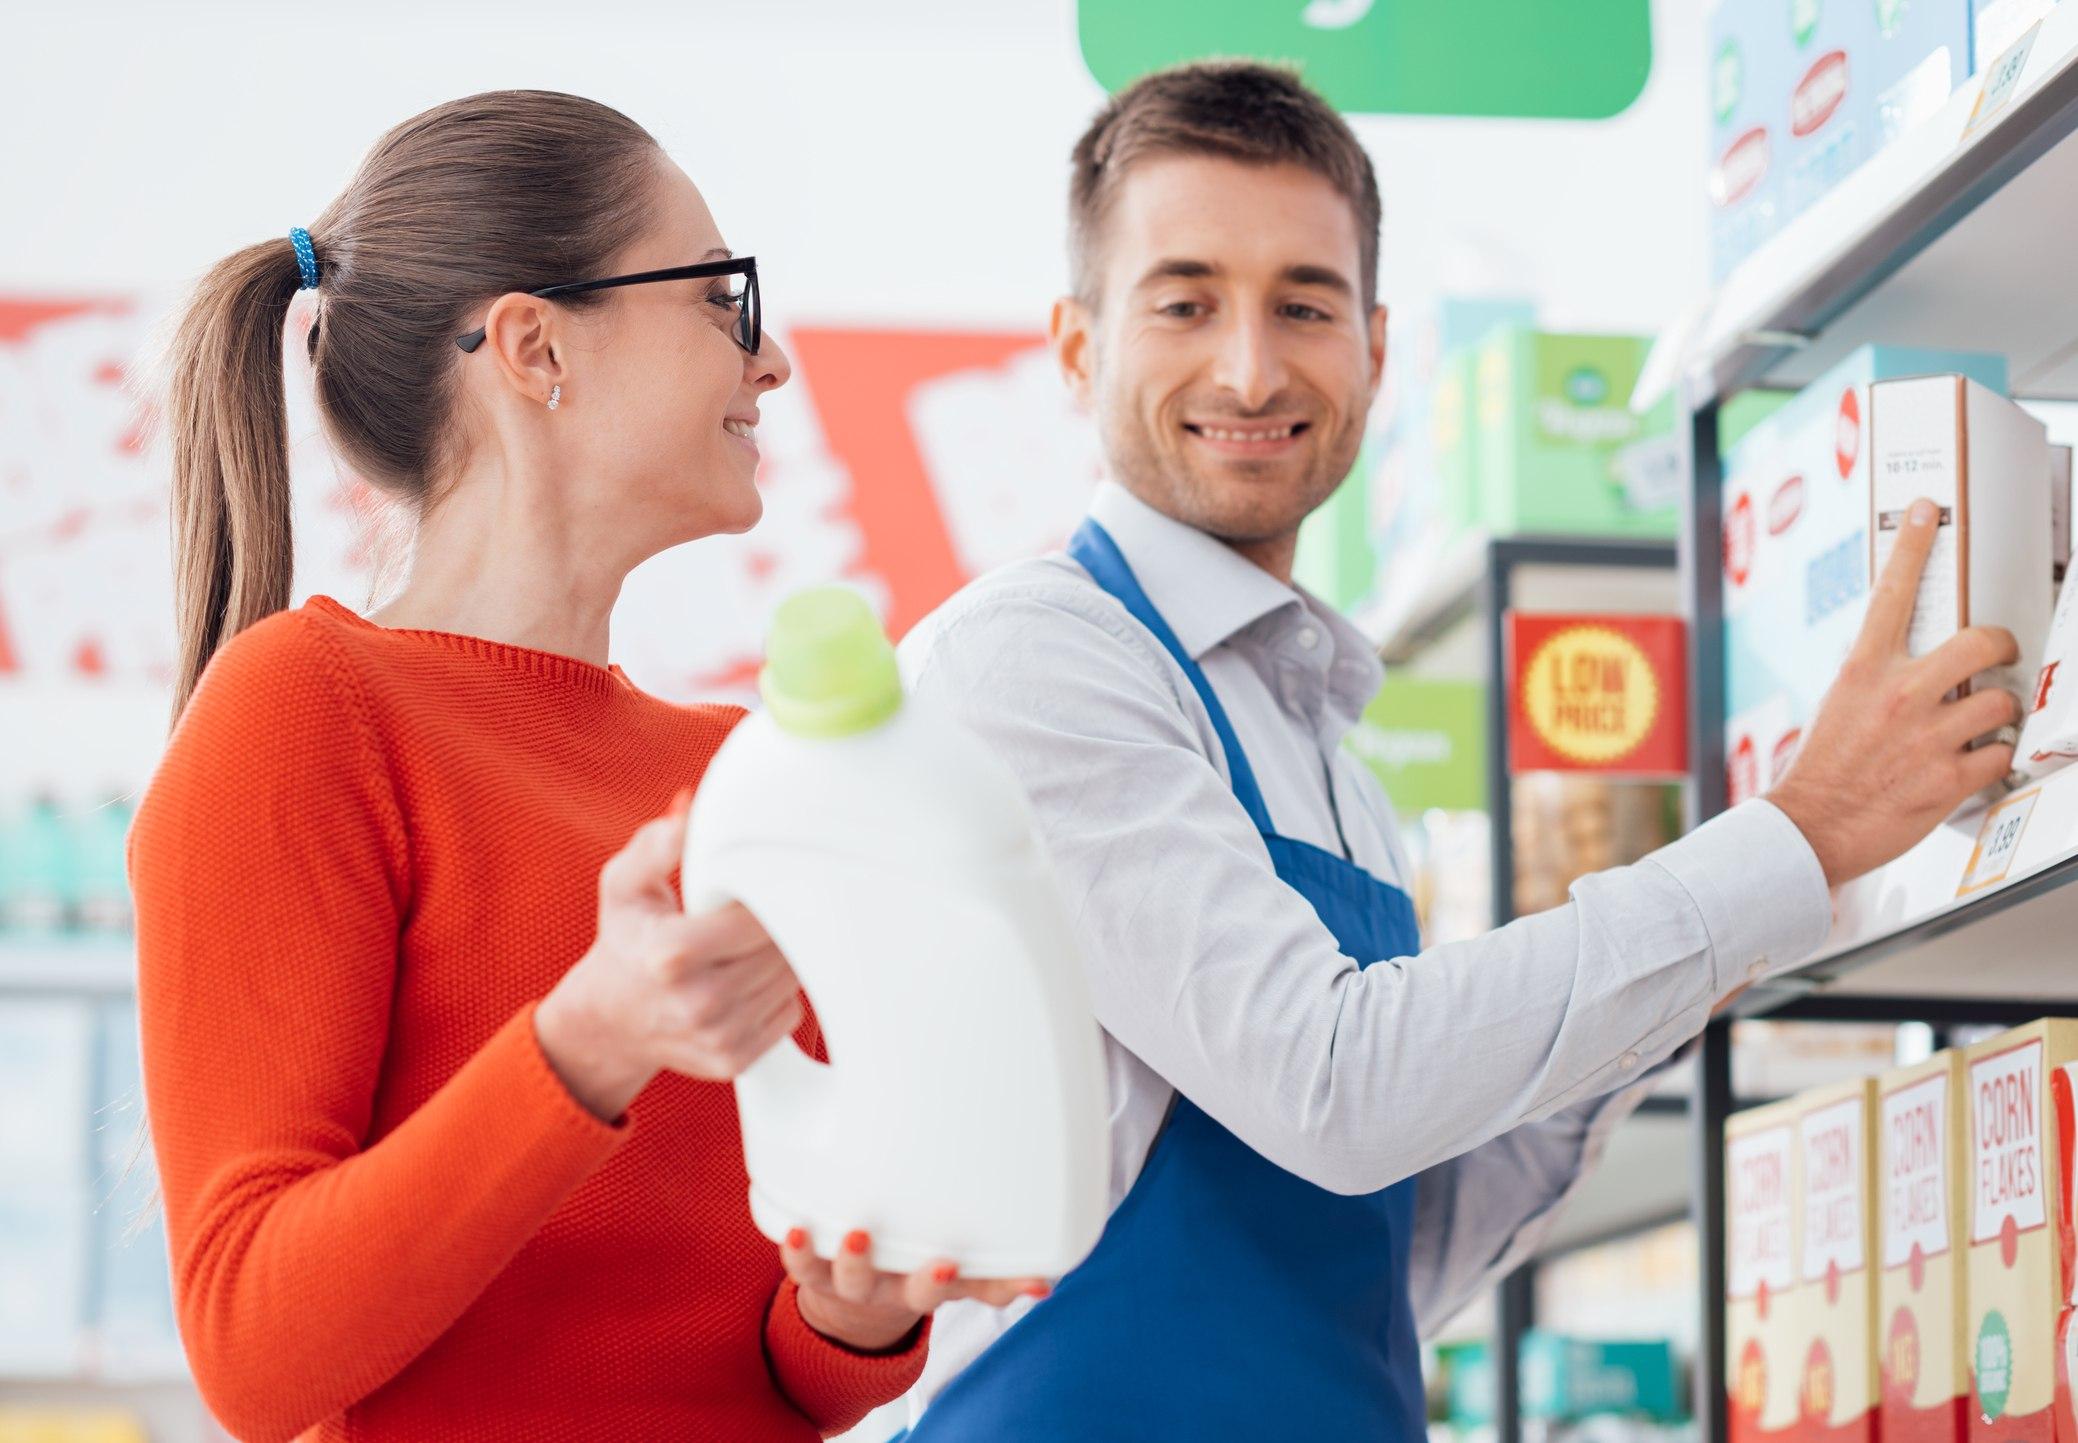 Supermarket clerk helping a customer